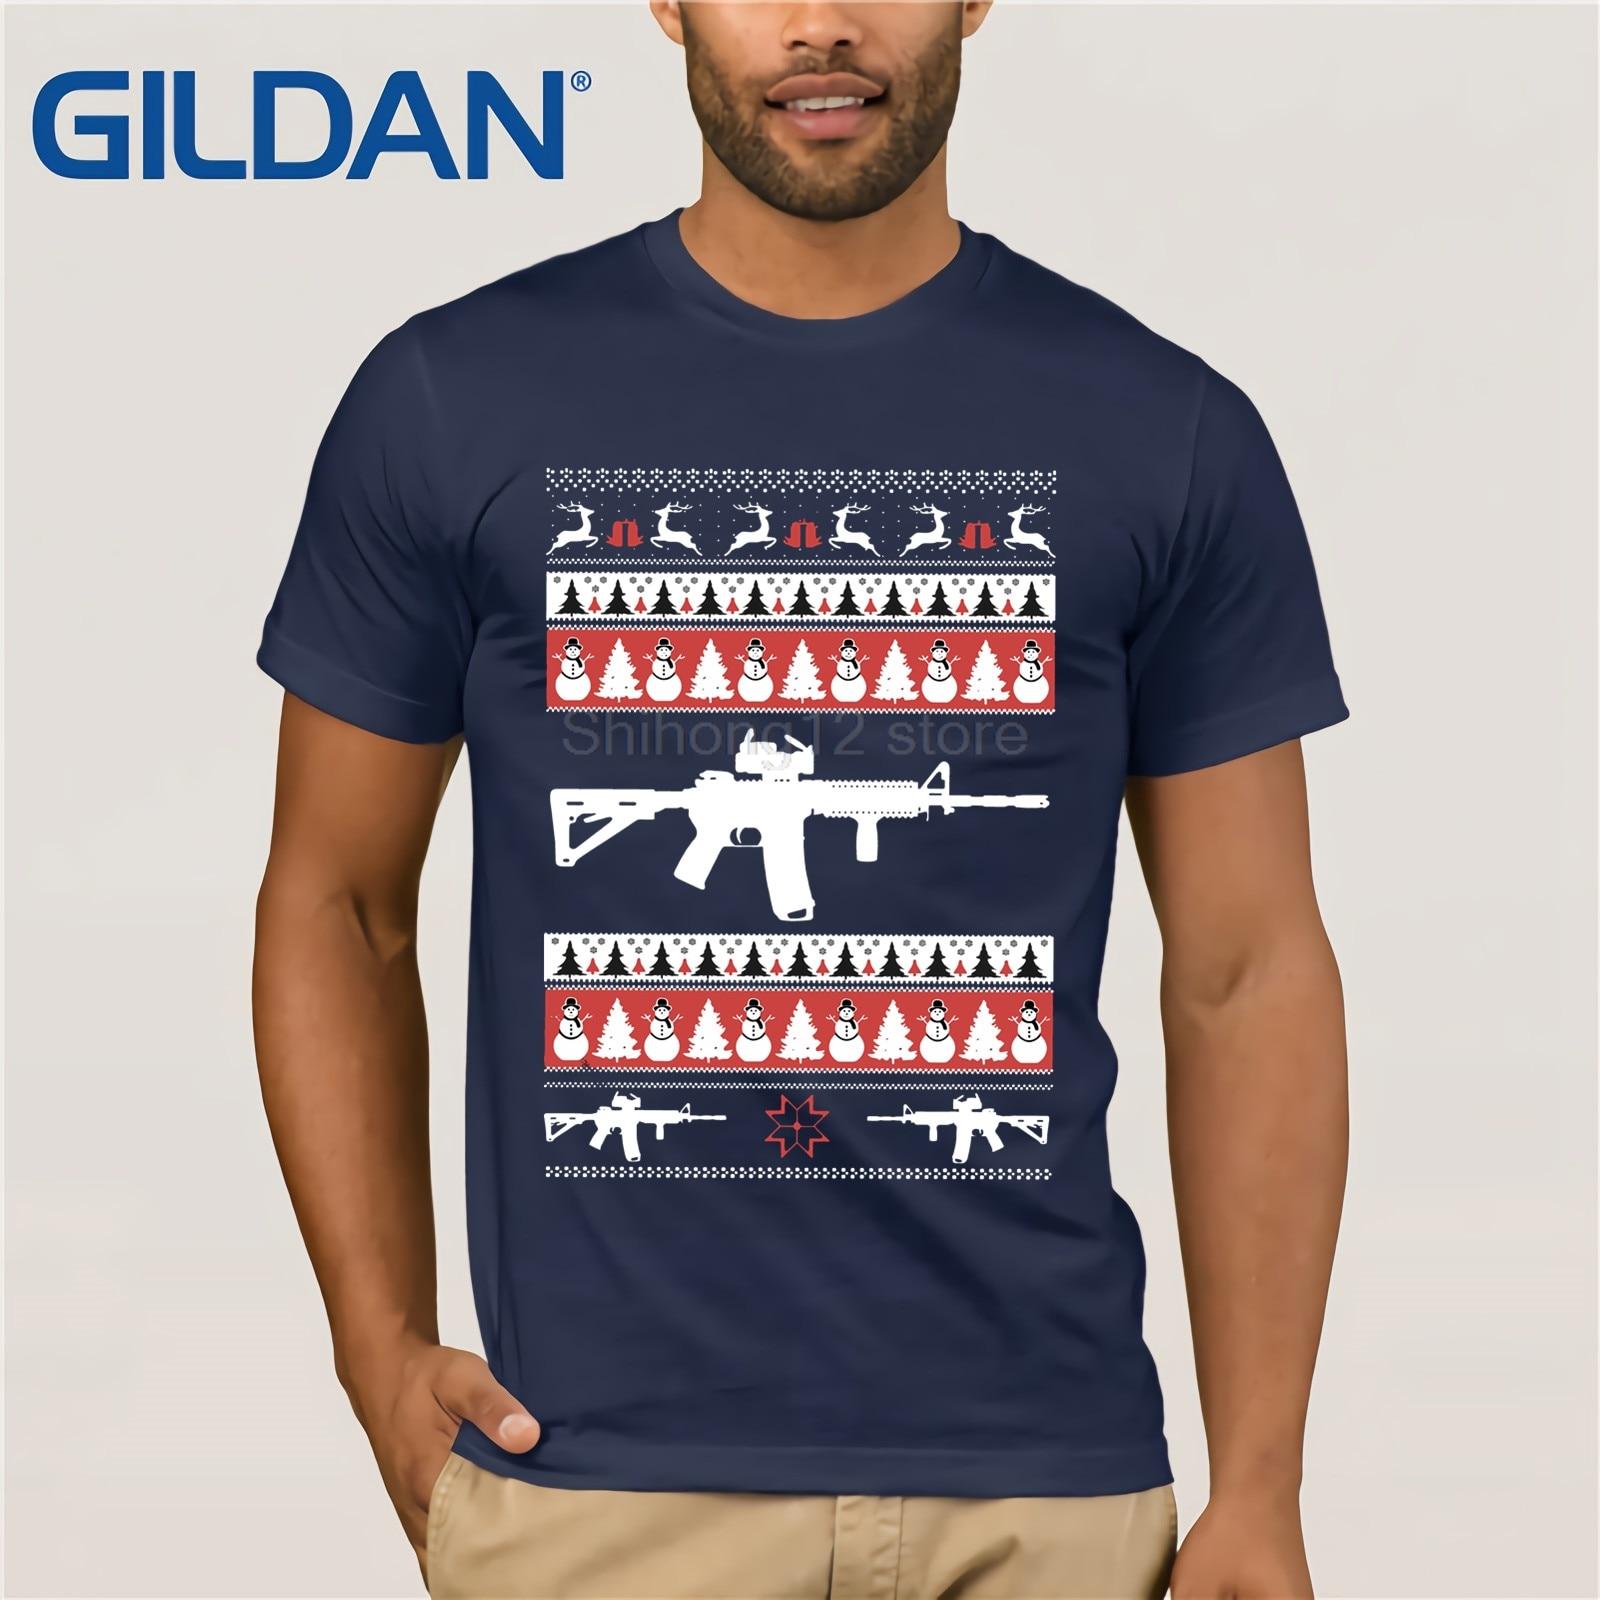 4893ee5bc22 gildan t shirt 2018 fashion men t shirt gildan ar 15 ar15 ugly christmas  sweater xmas